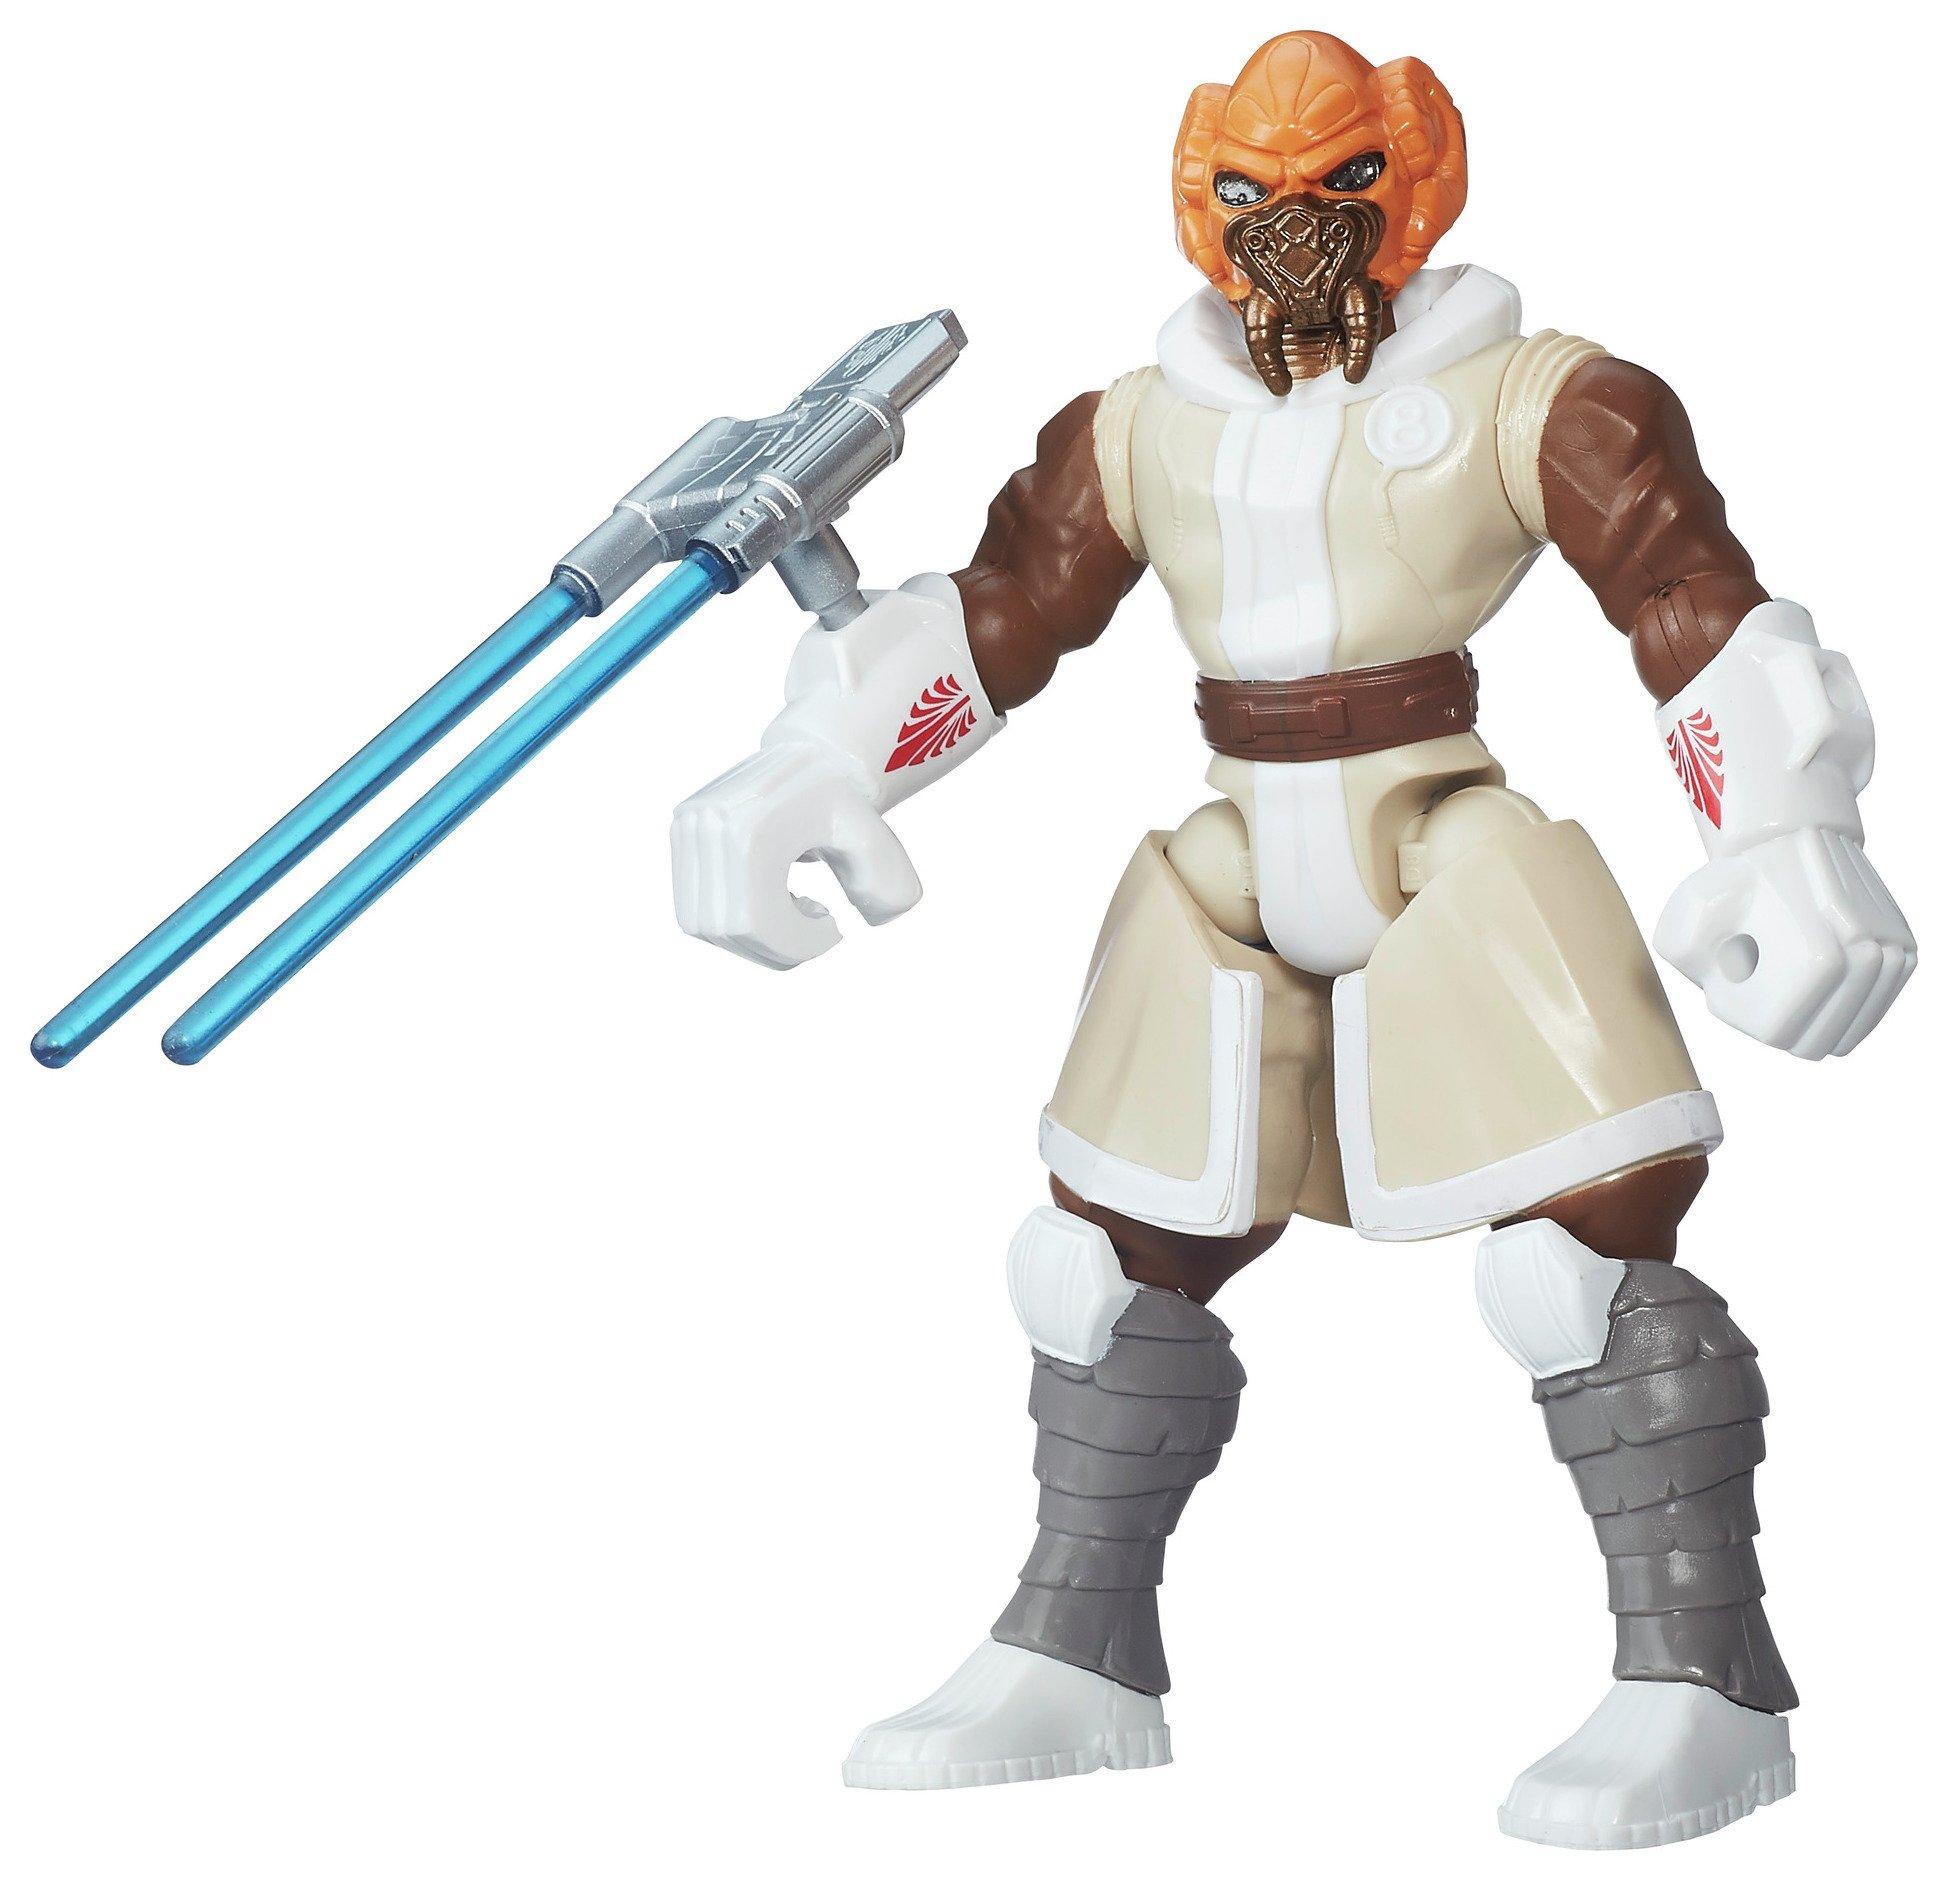 Image of Star Wars The Clone Wars Plo Koon